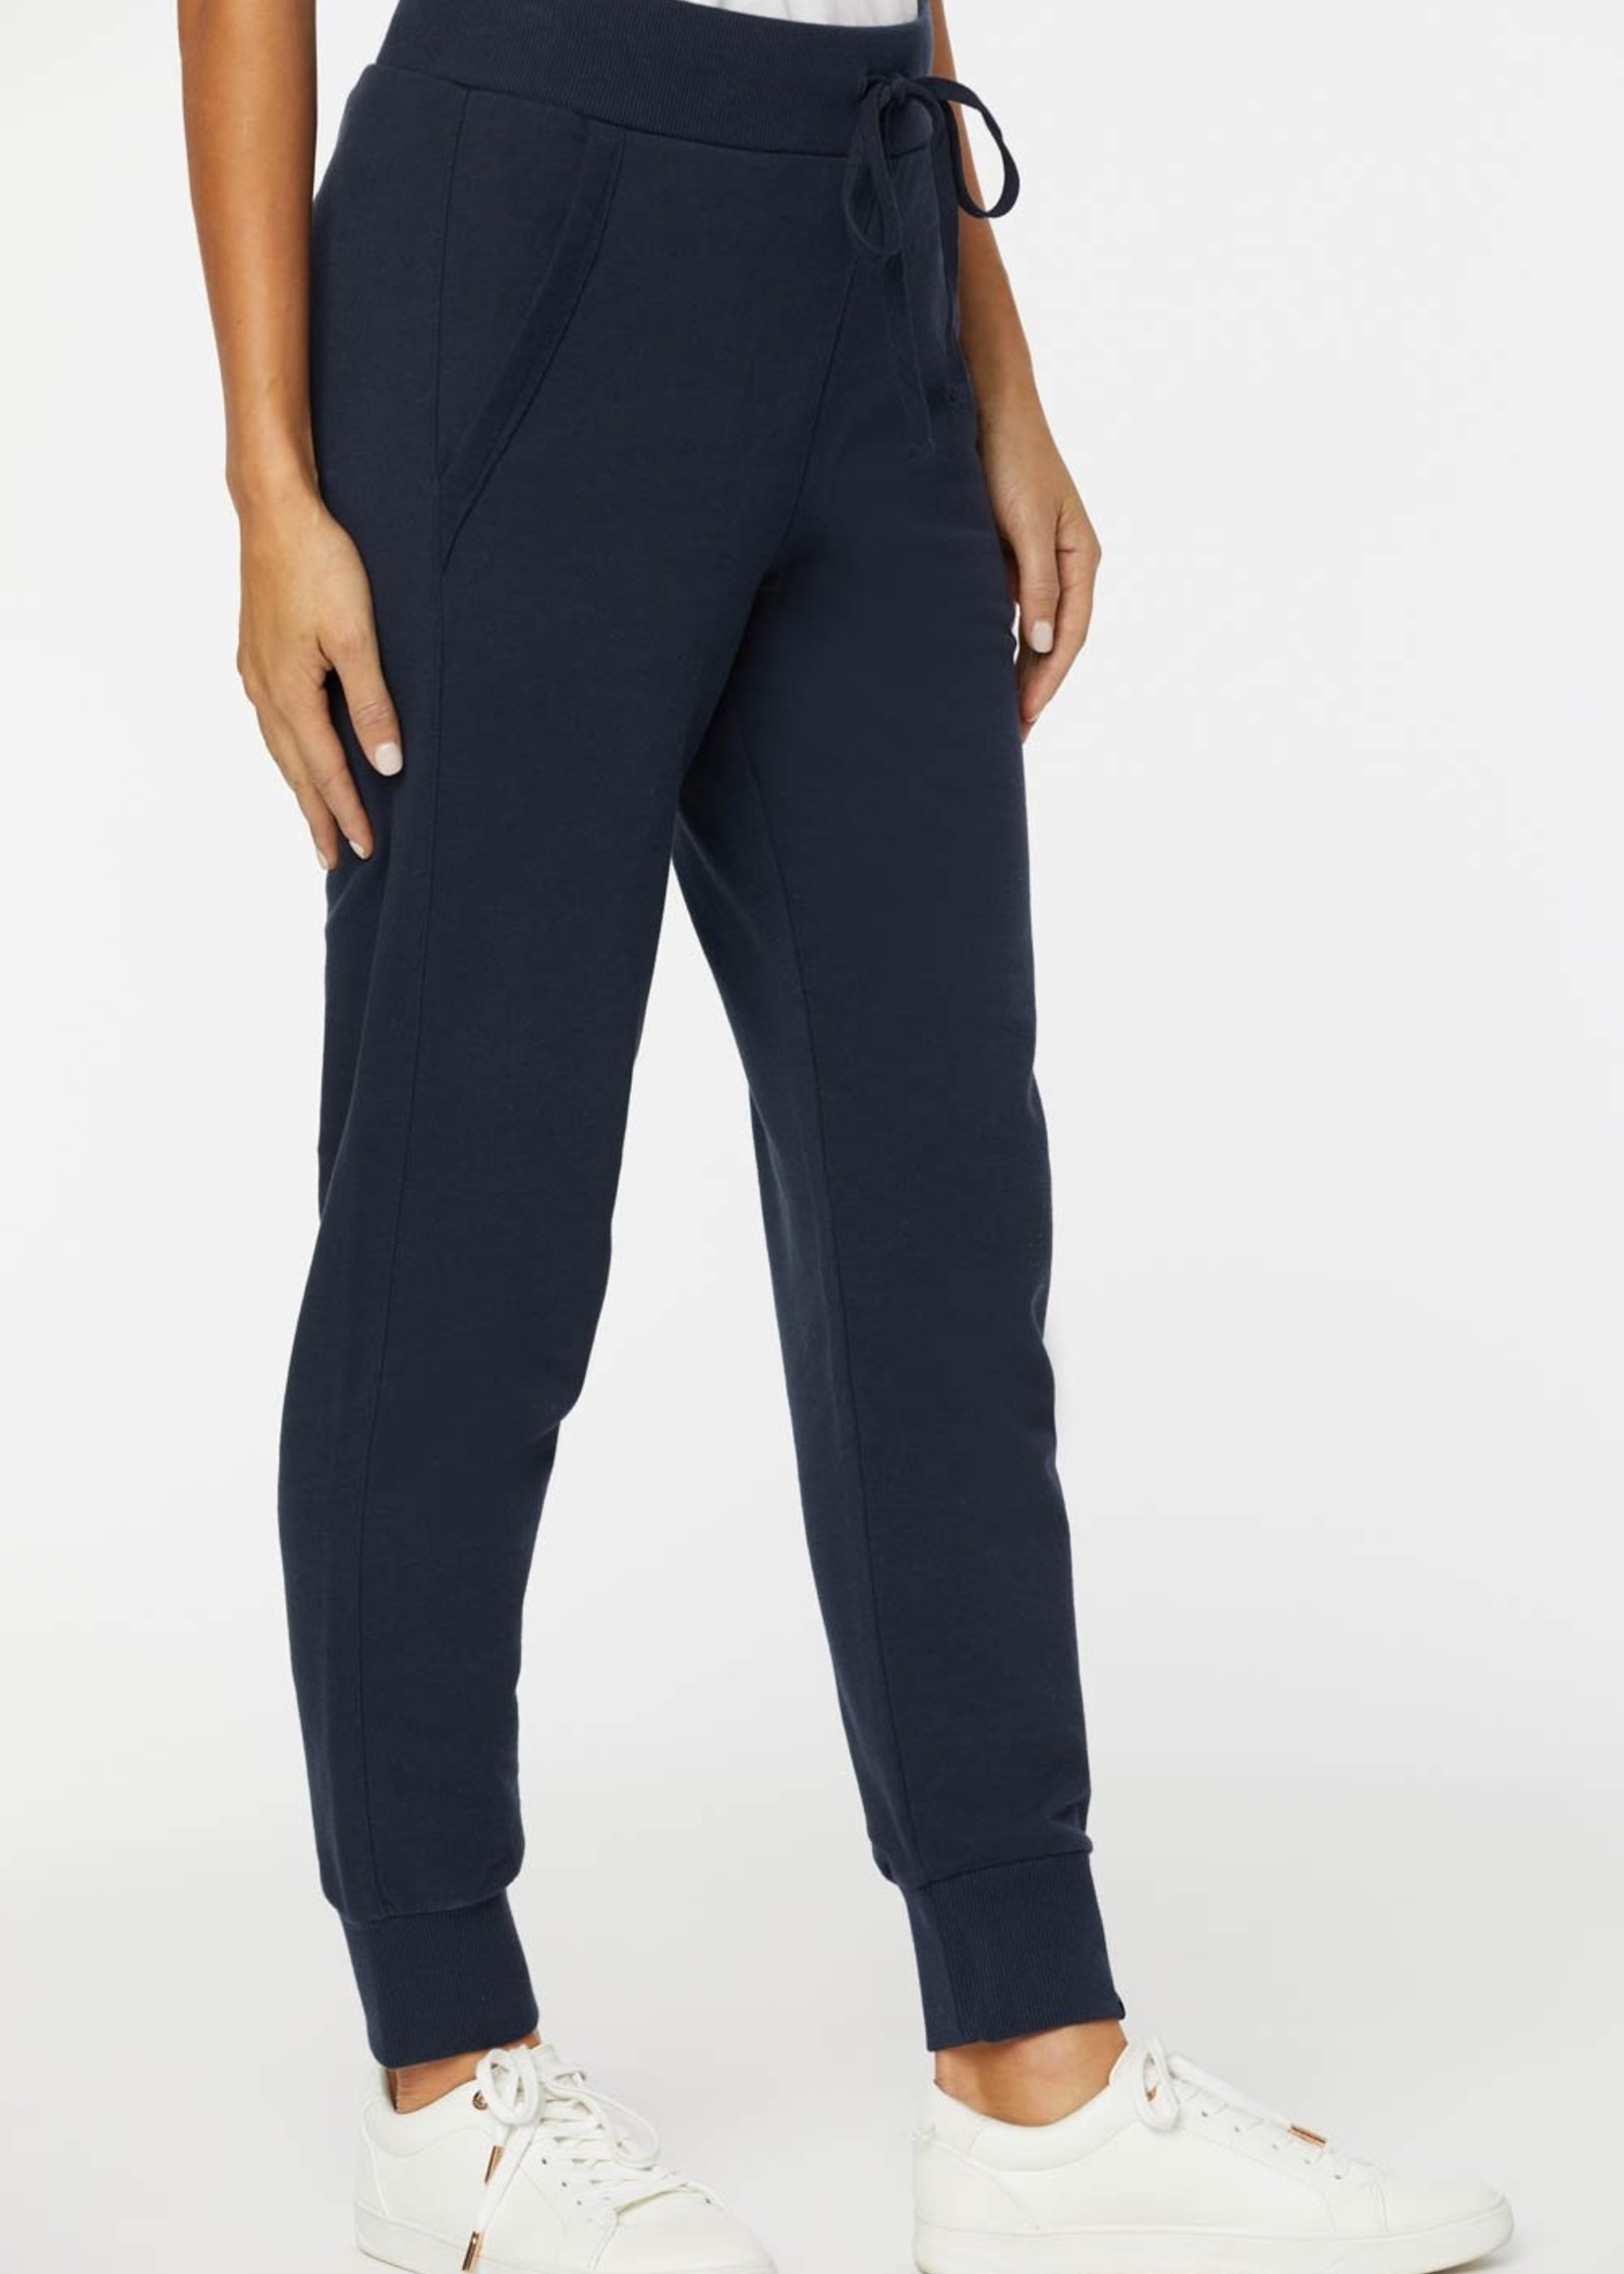 NYDJ Drawstring Jogger Pants